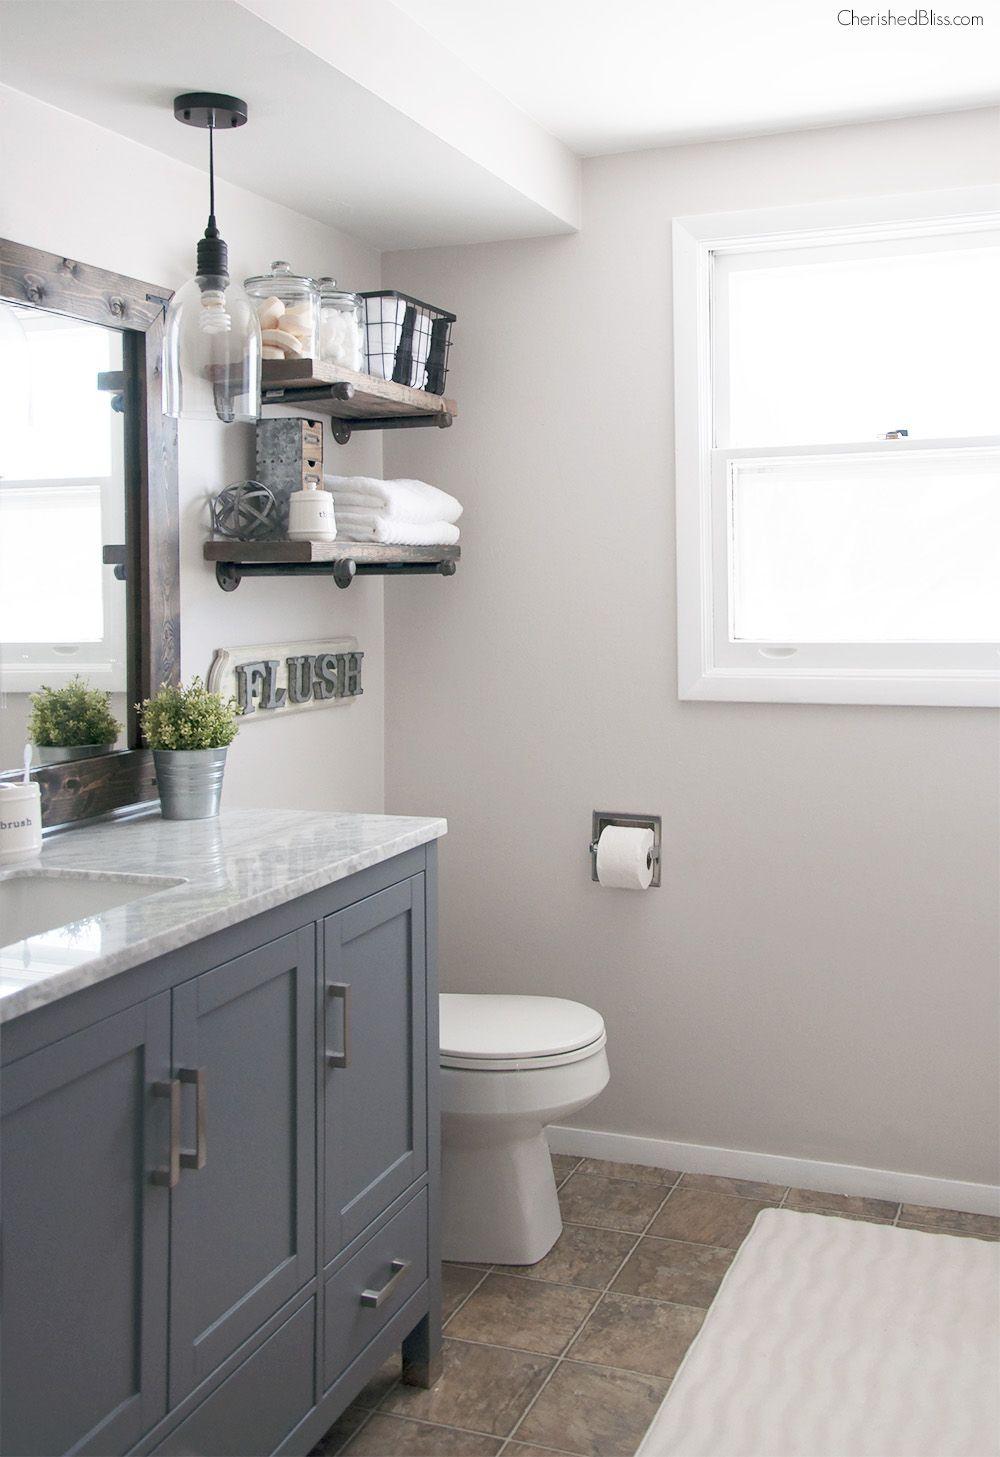 Industrial Farmhouse Bathroom Reveal Small Farmhouse Bathroom Bathroom Farmhouse Style Farmhouse Bathroom Accessories